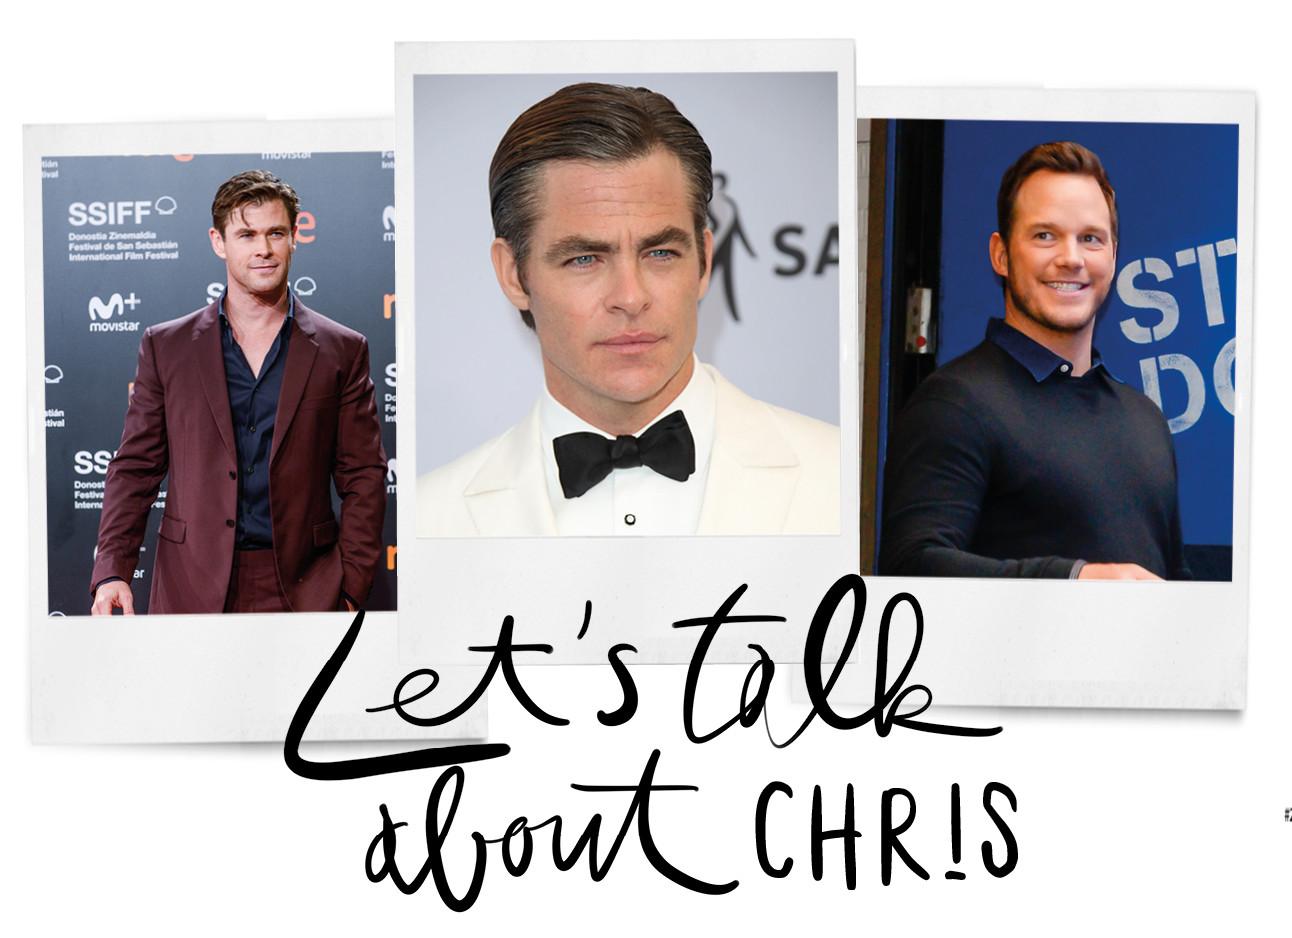 chris pratt, chris pine, chris hemsworth polaroids